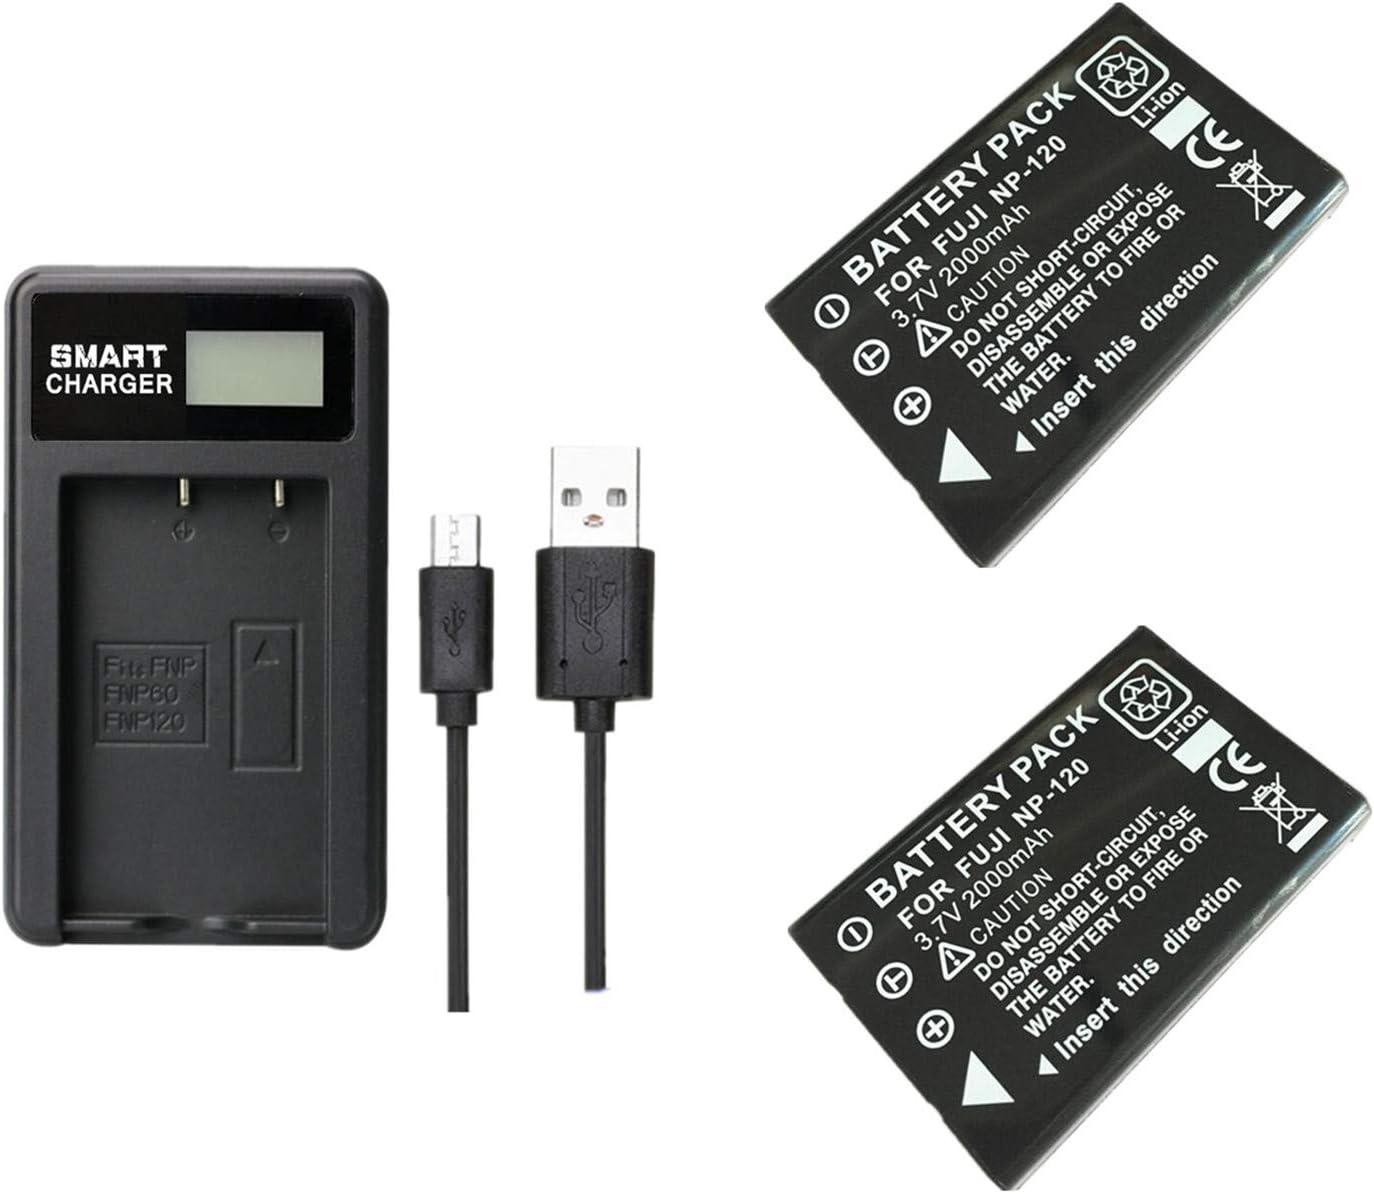 2 Stück 2000 Mah Np 120 Np 120 Batterie Mit Ladegerät Kamera